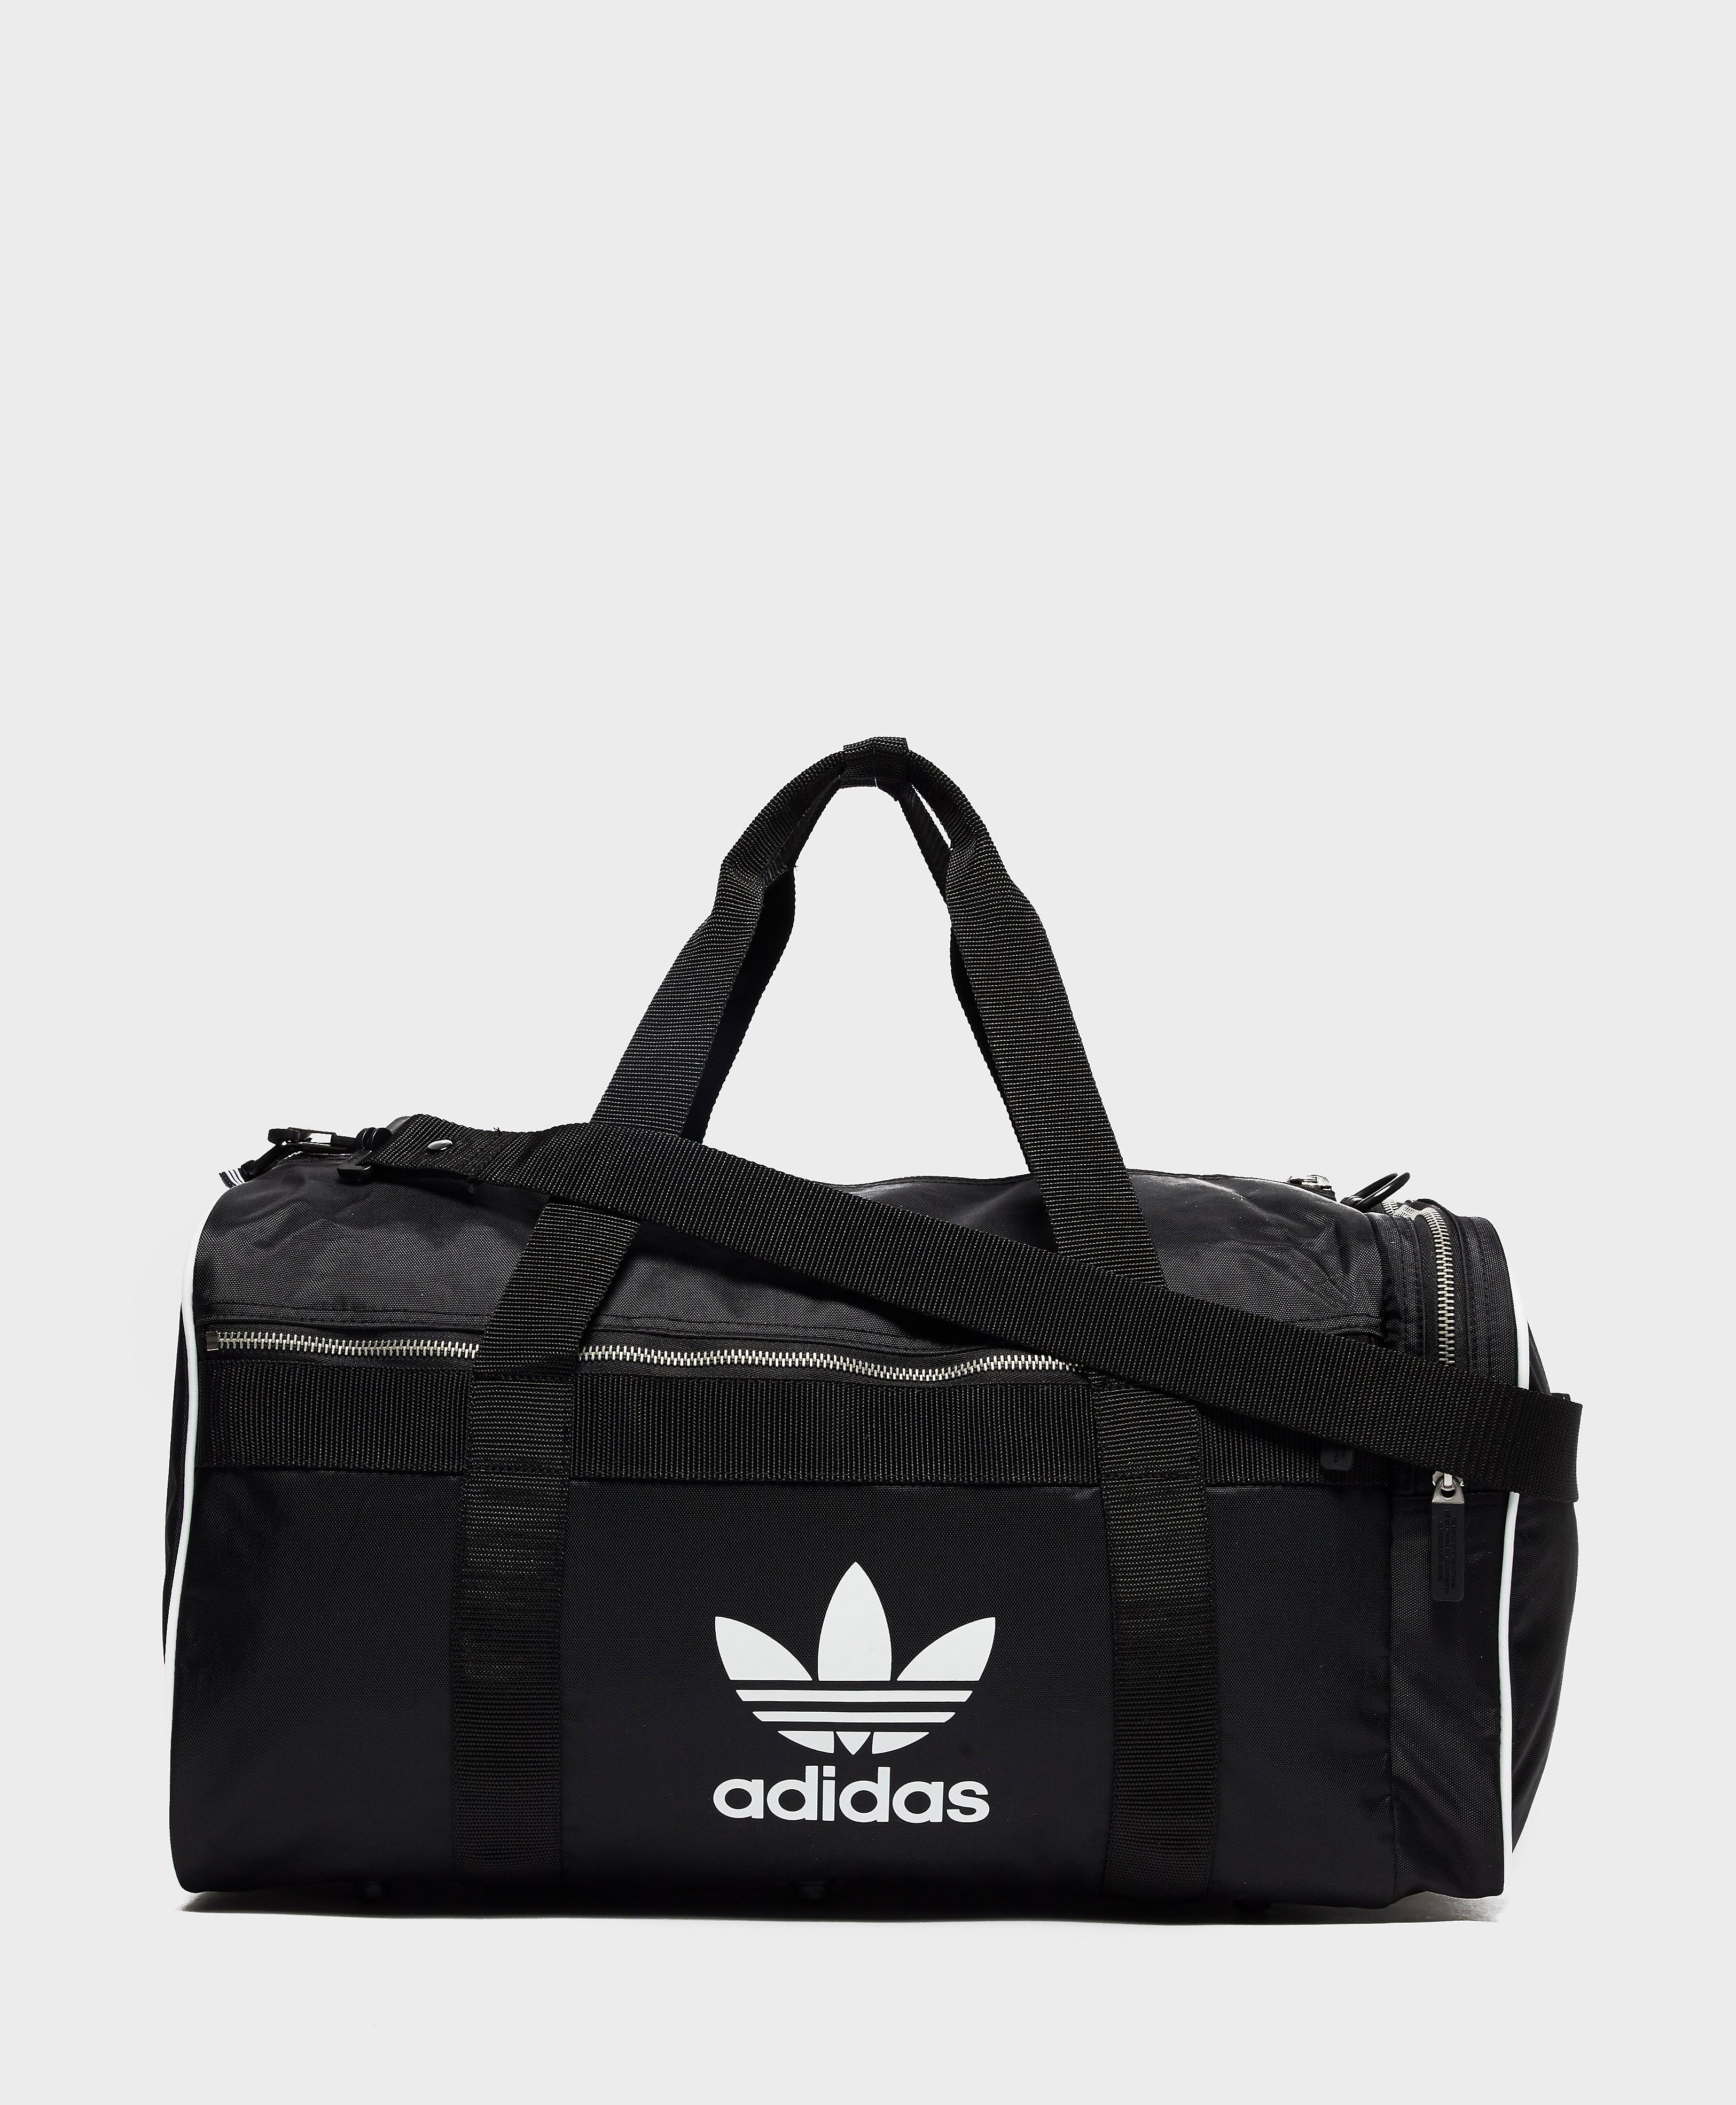 adidas Originals Trefoil Duffle Bag